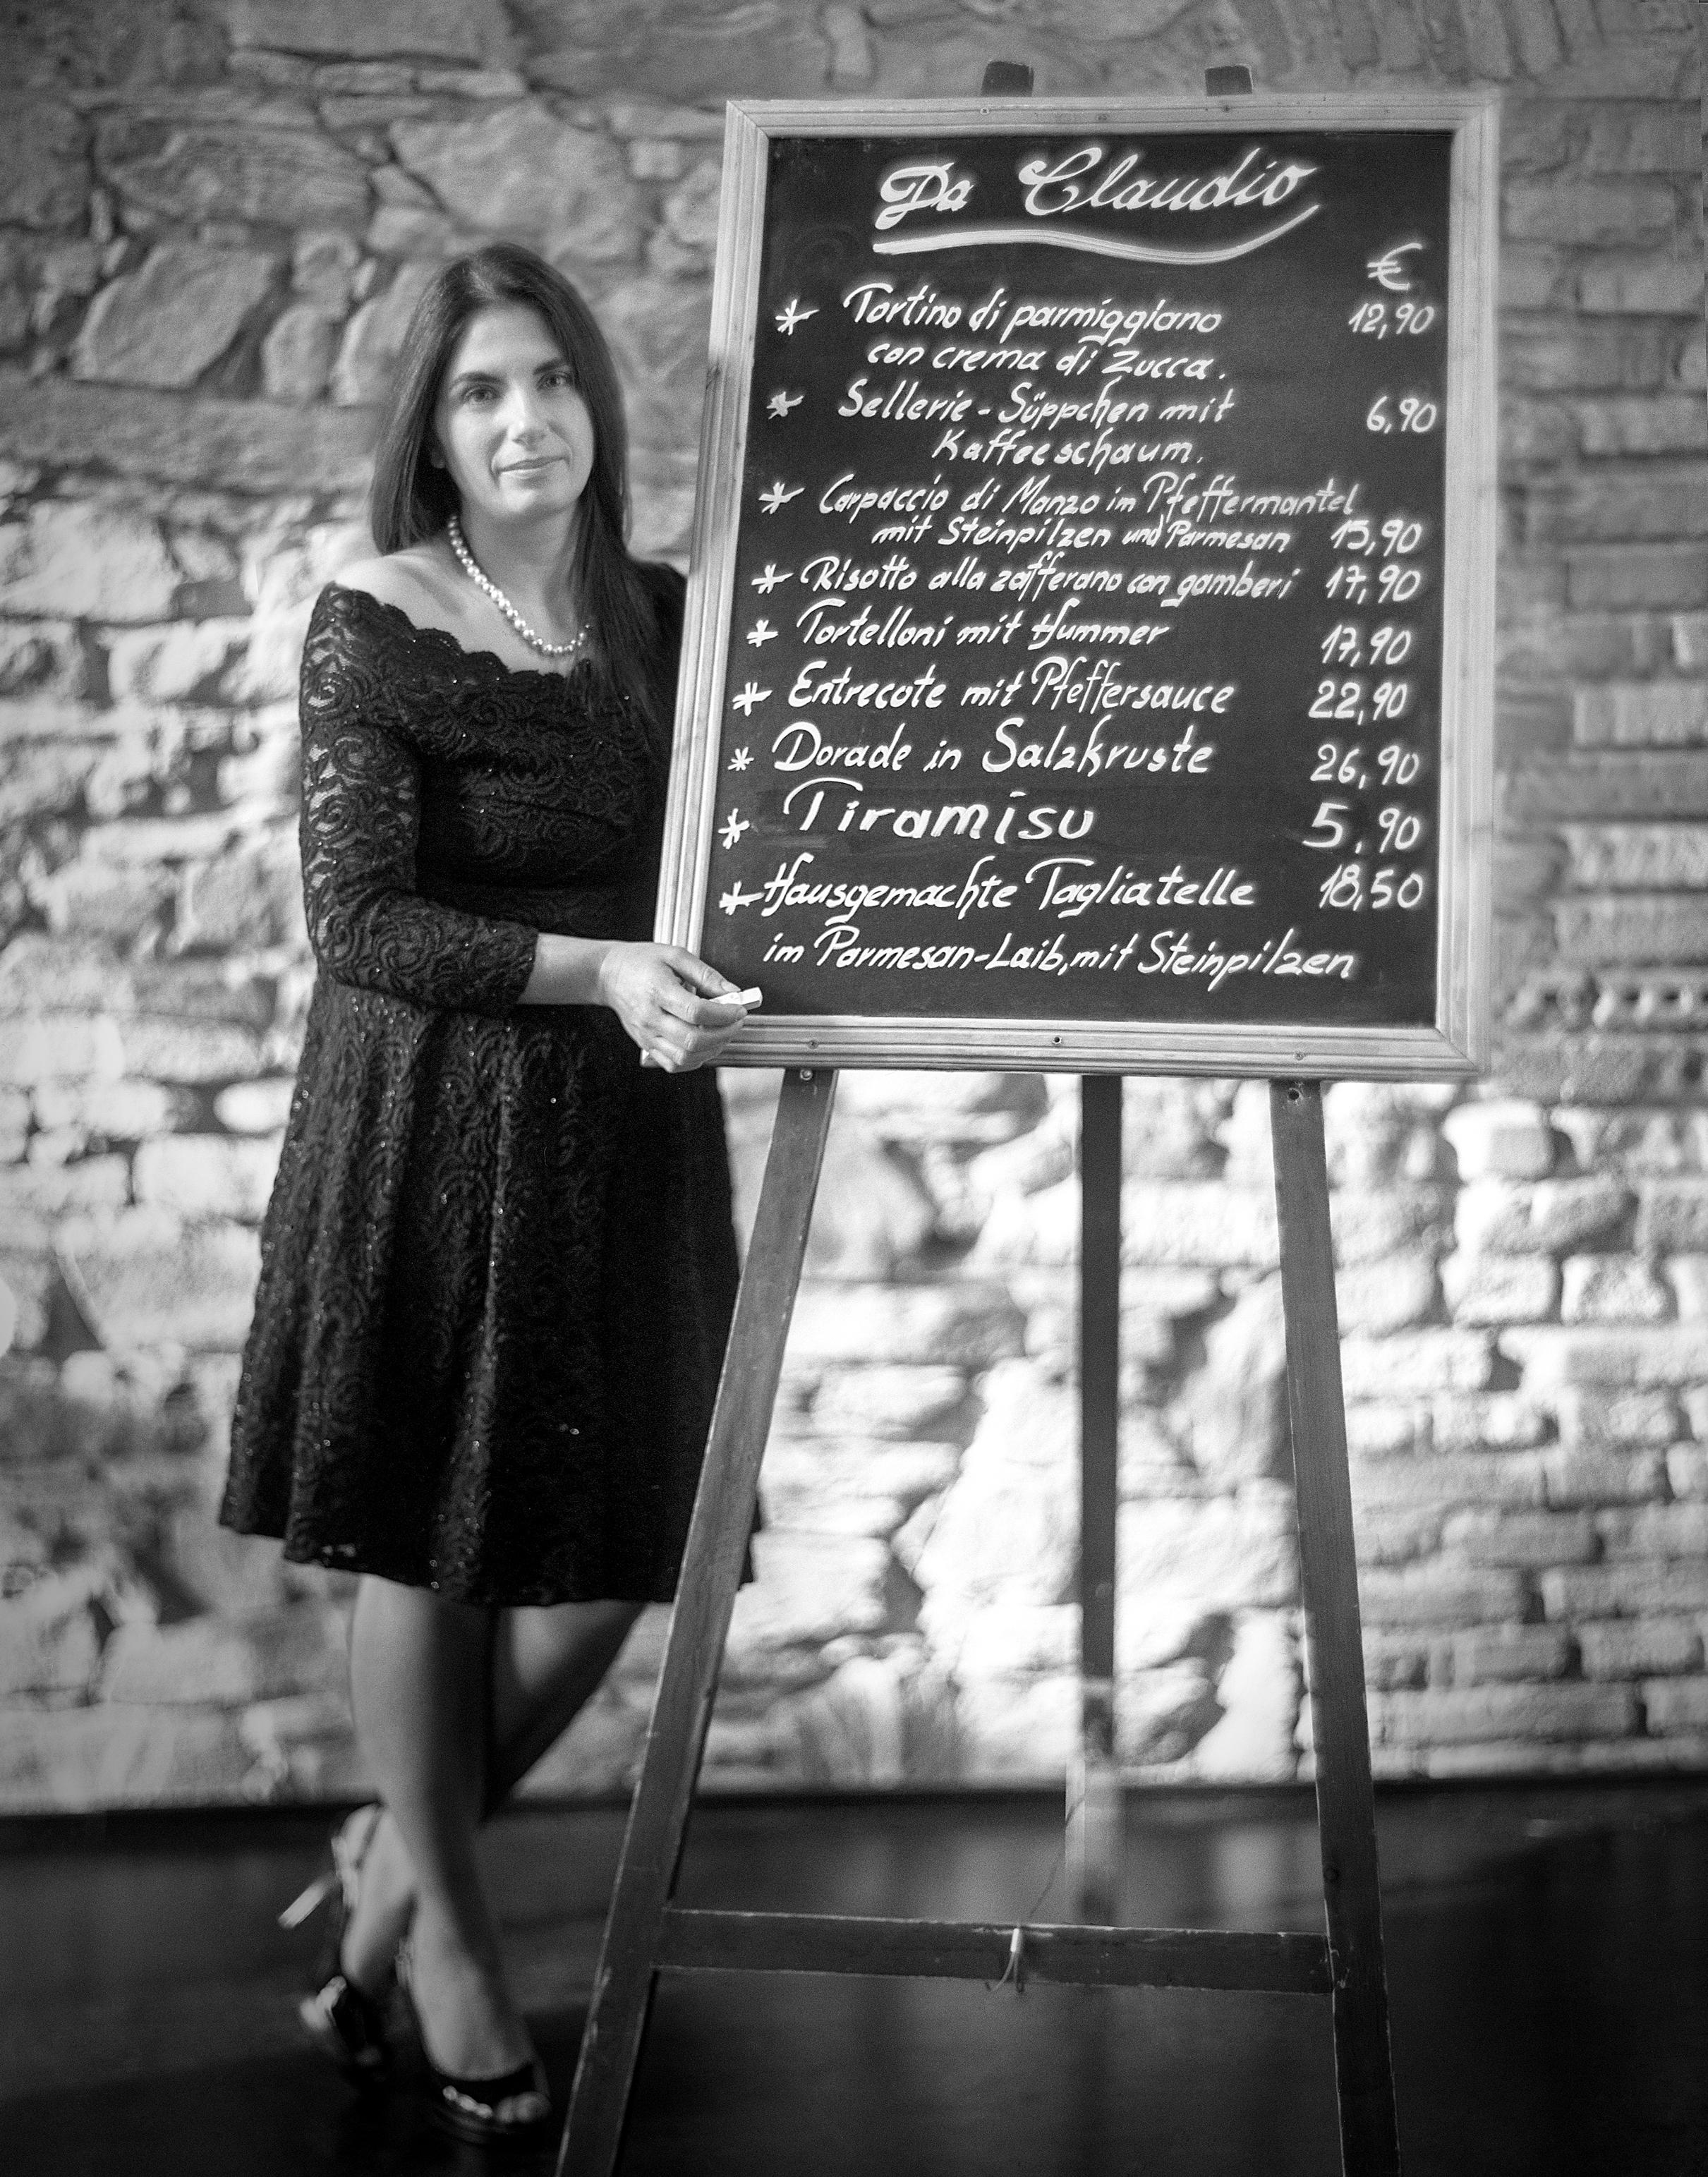 15- Unternehmerportraits 4x5 analog speed graflex aero ektar familienportraits pentax 67 blackandwhite film trix 320 georg schmidt fotograf aus aschaffenburg da claudio 4.jpg